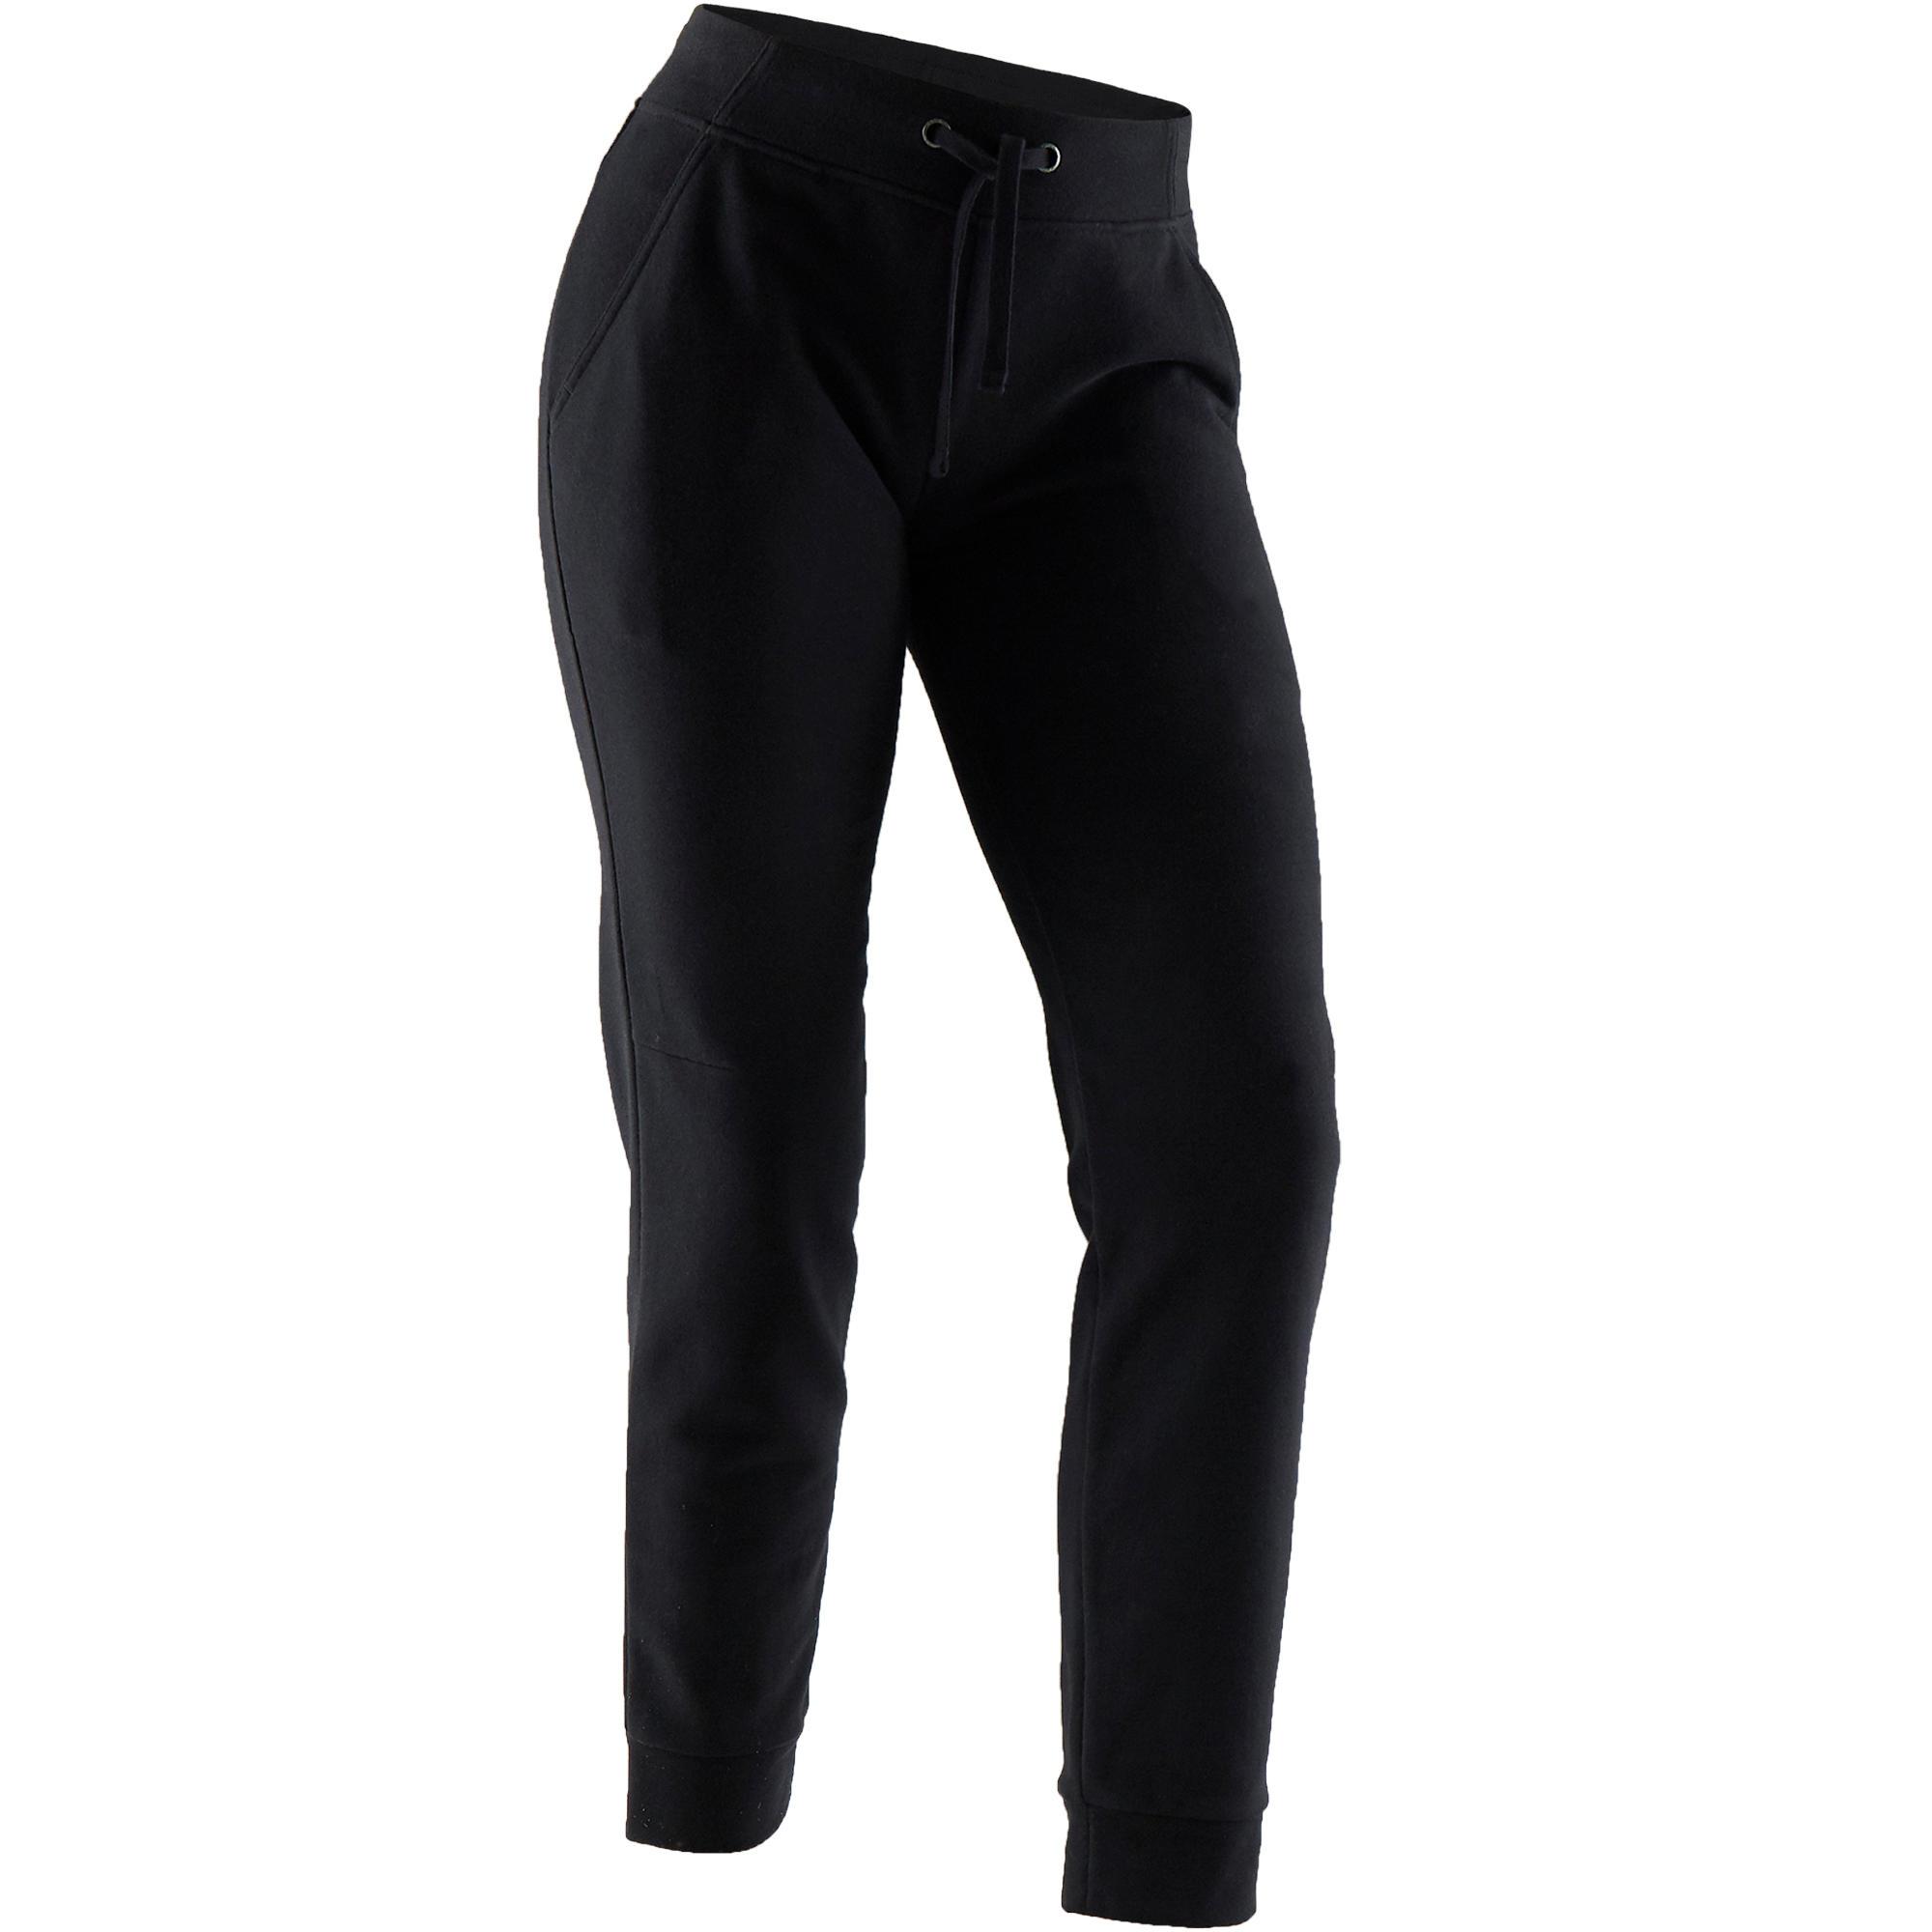 Vêtements Femme 500 Pilates Noir Gym Douce Pantalon Regular n0Nvm8w